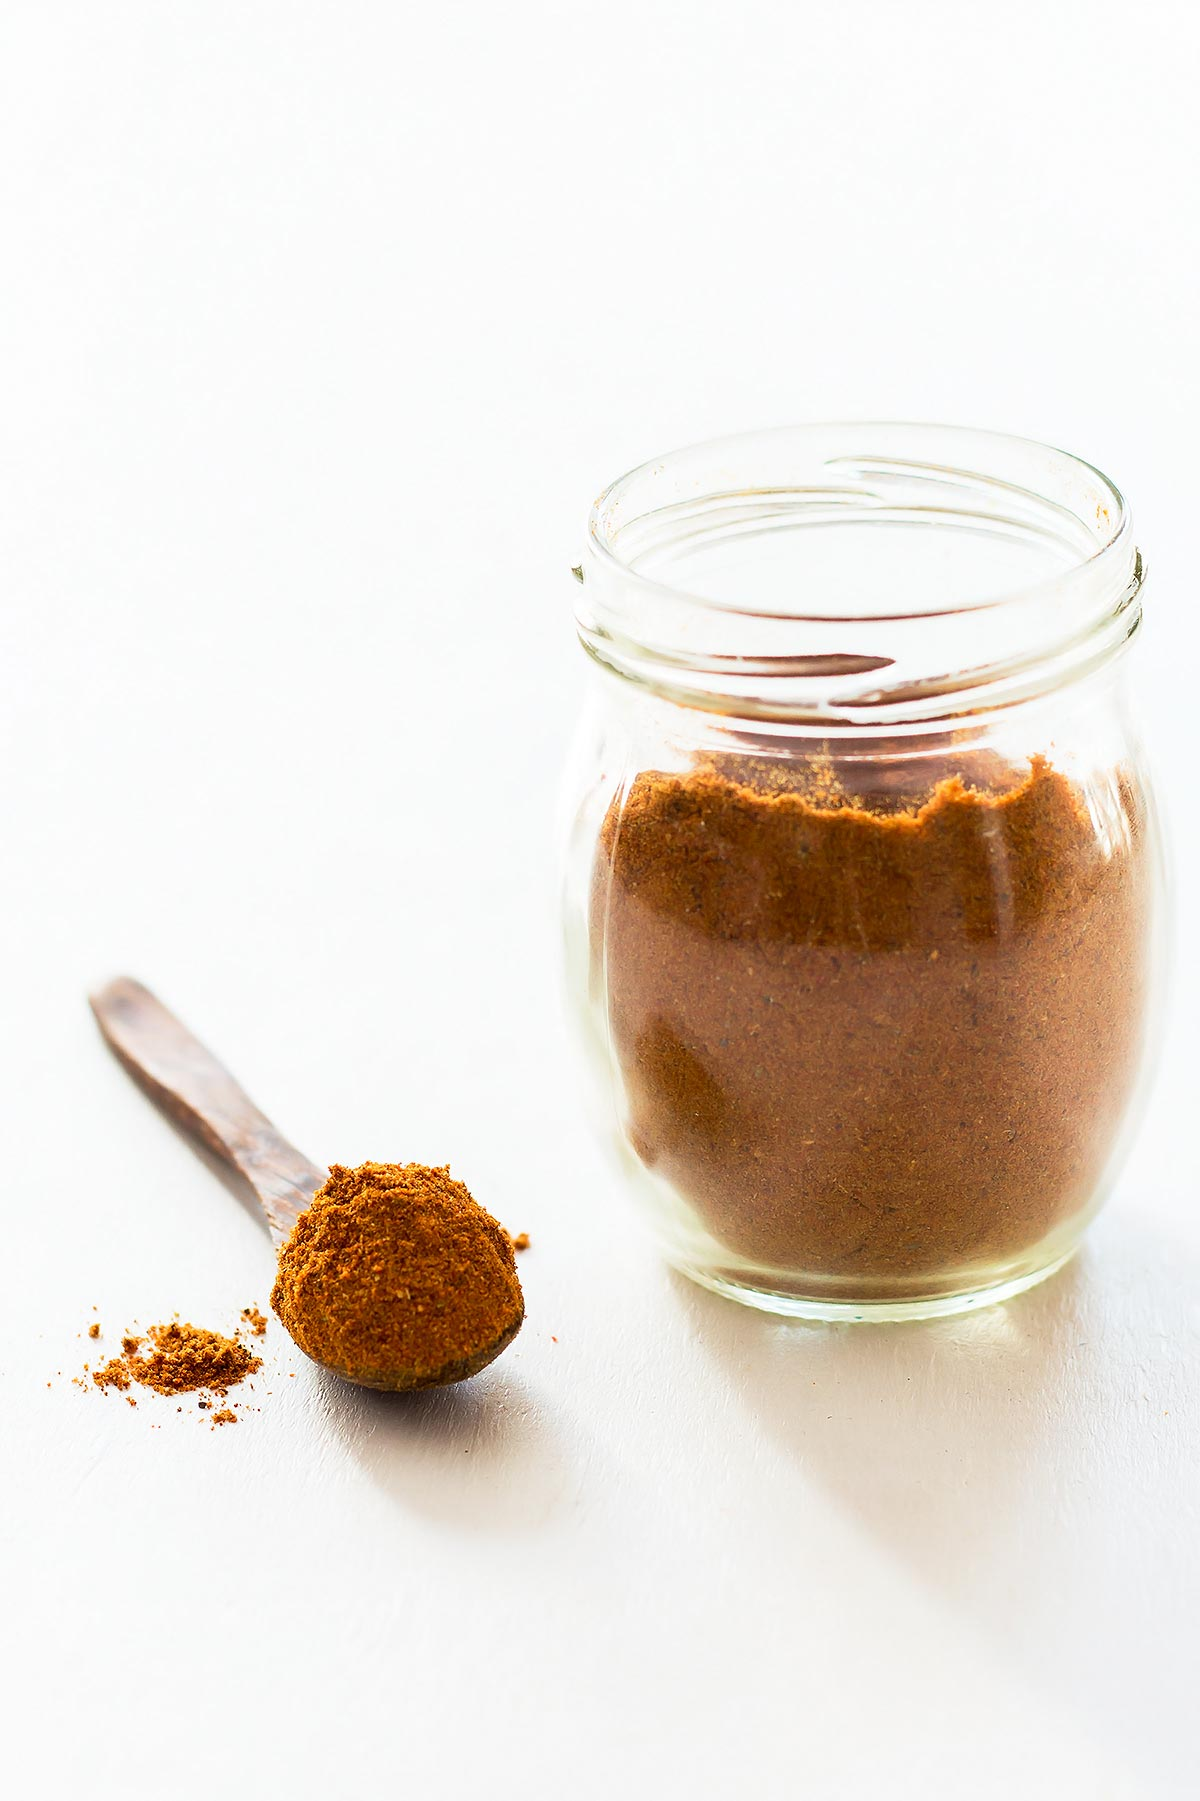 Homemade Tandoori Masala in jar and on spoon